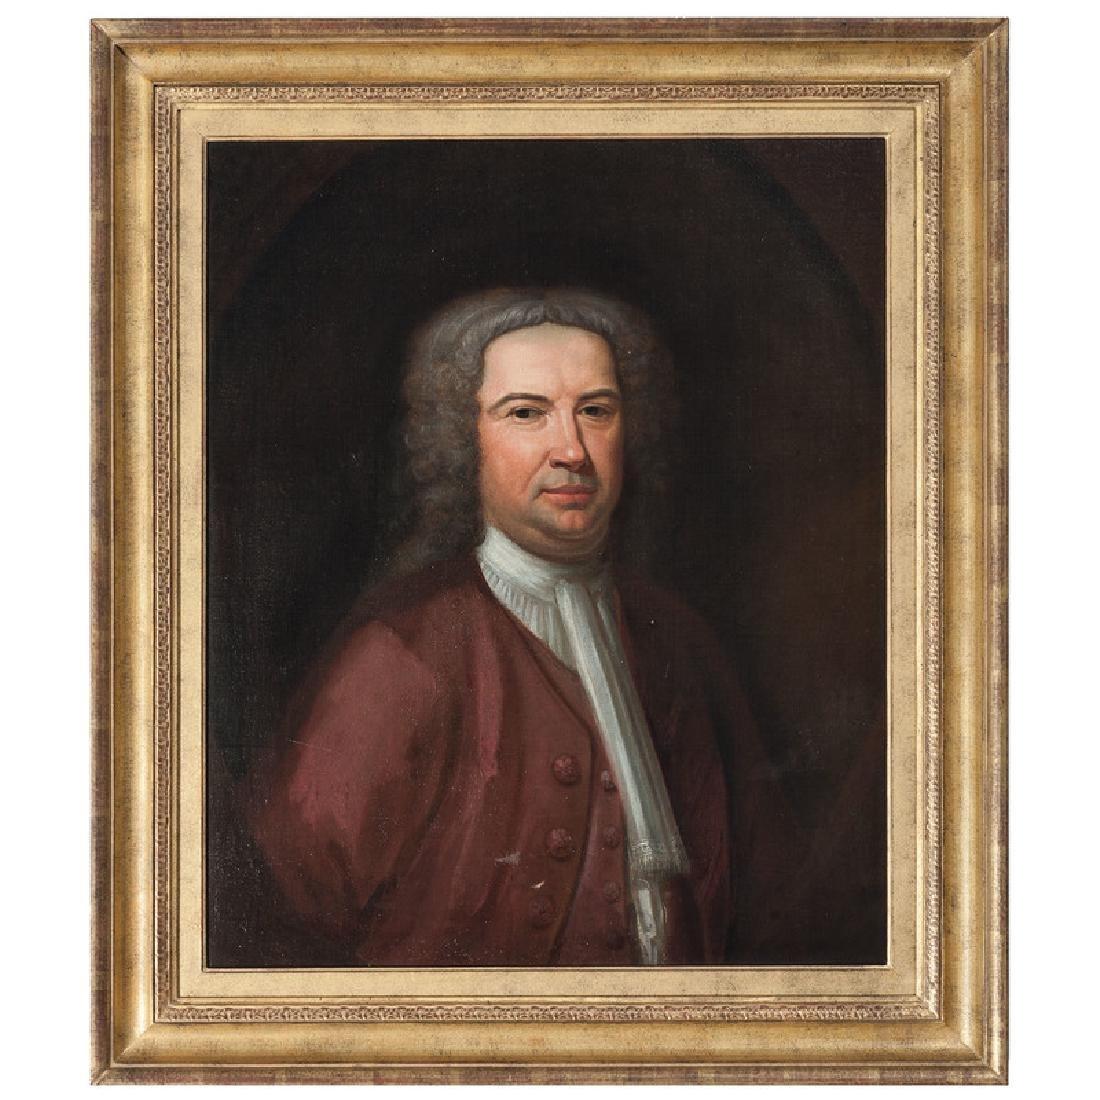 English Portrait of a Wigged Man